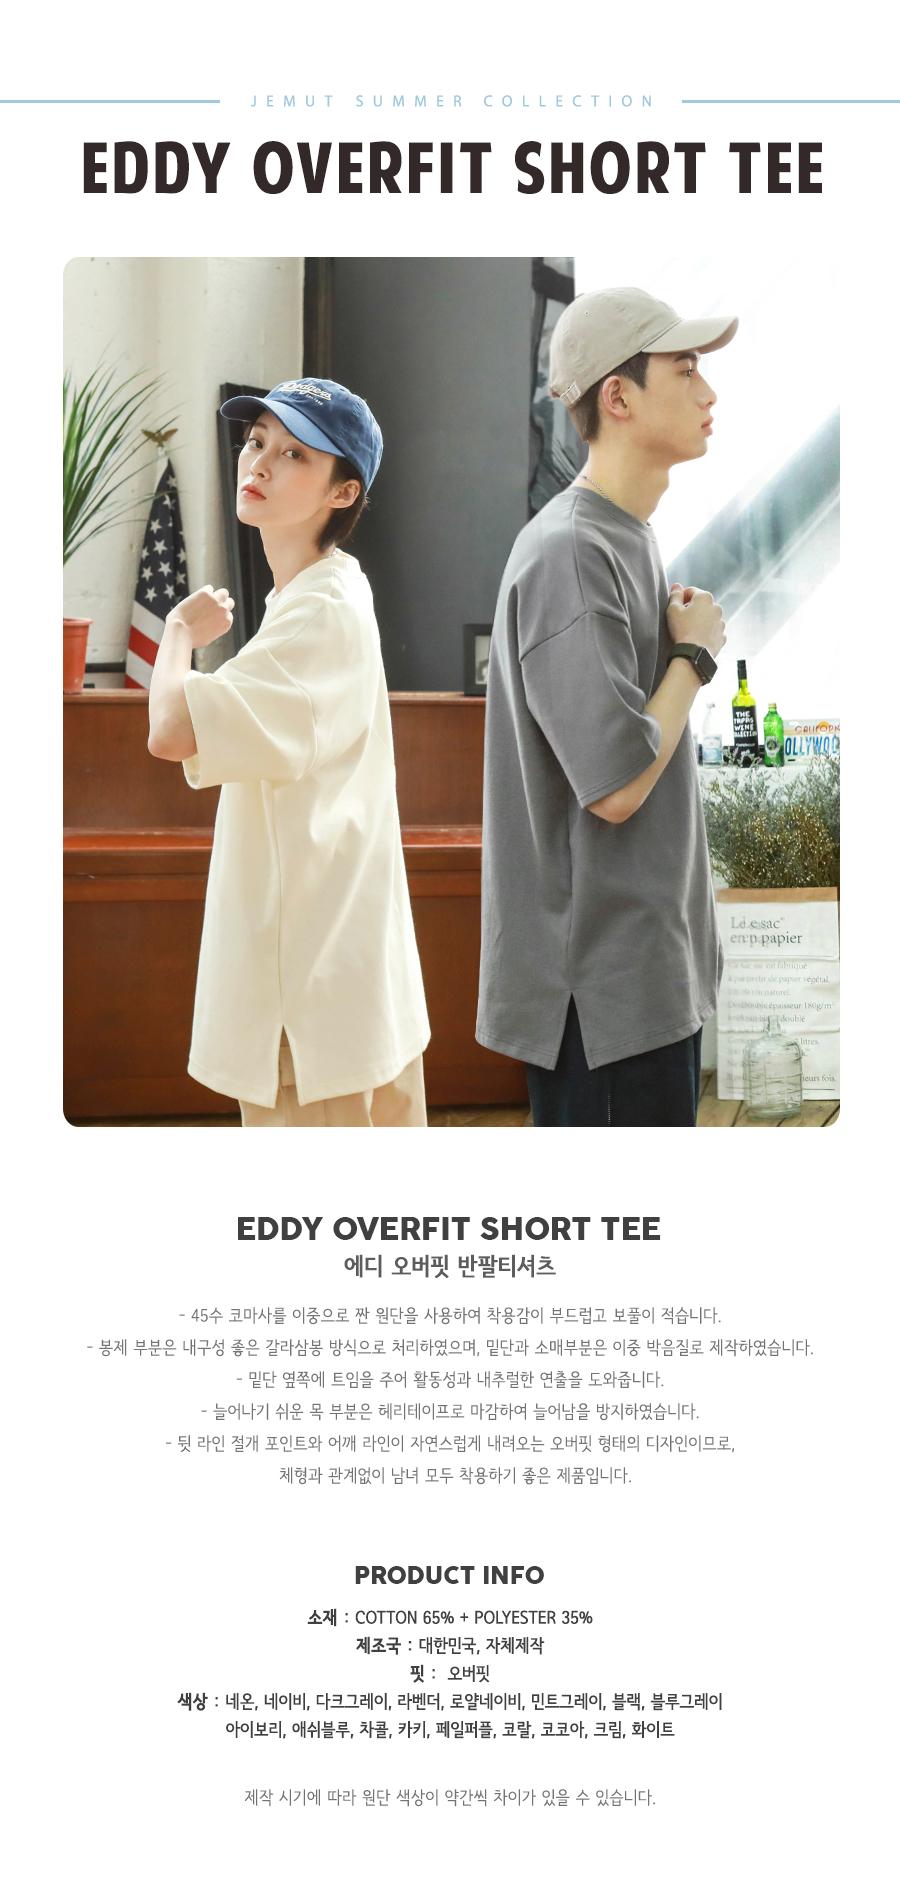 20190315_eddy_overfit_short_tee_title_kj.jpg